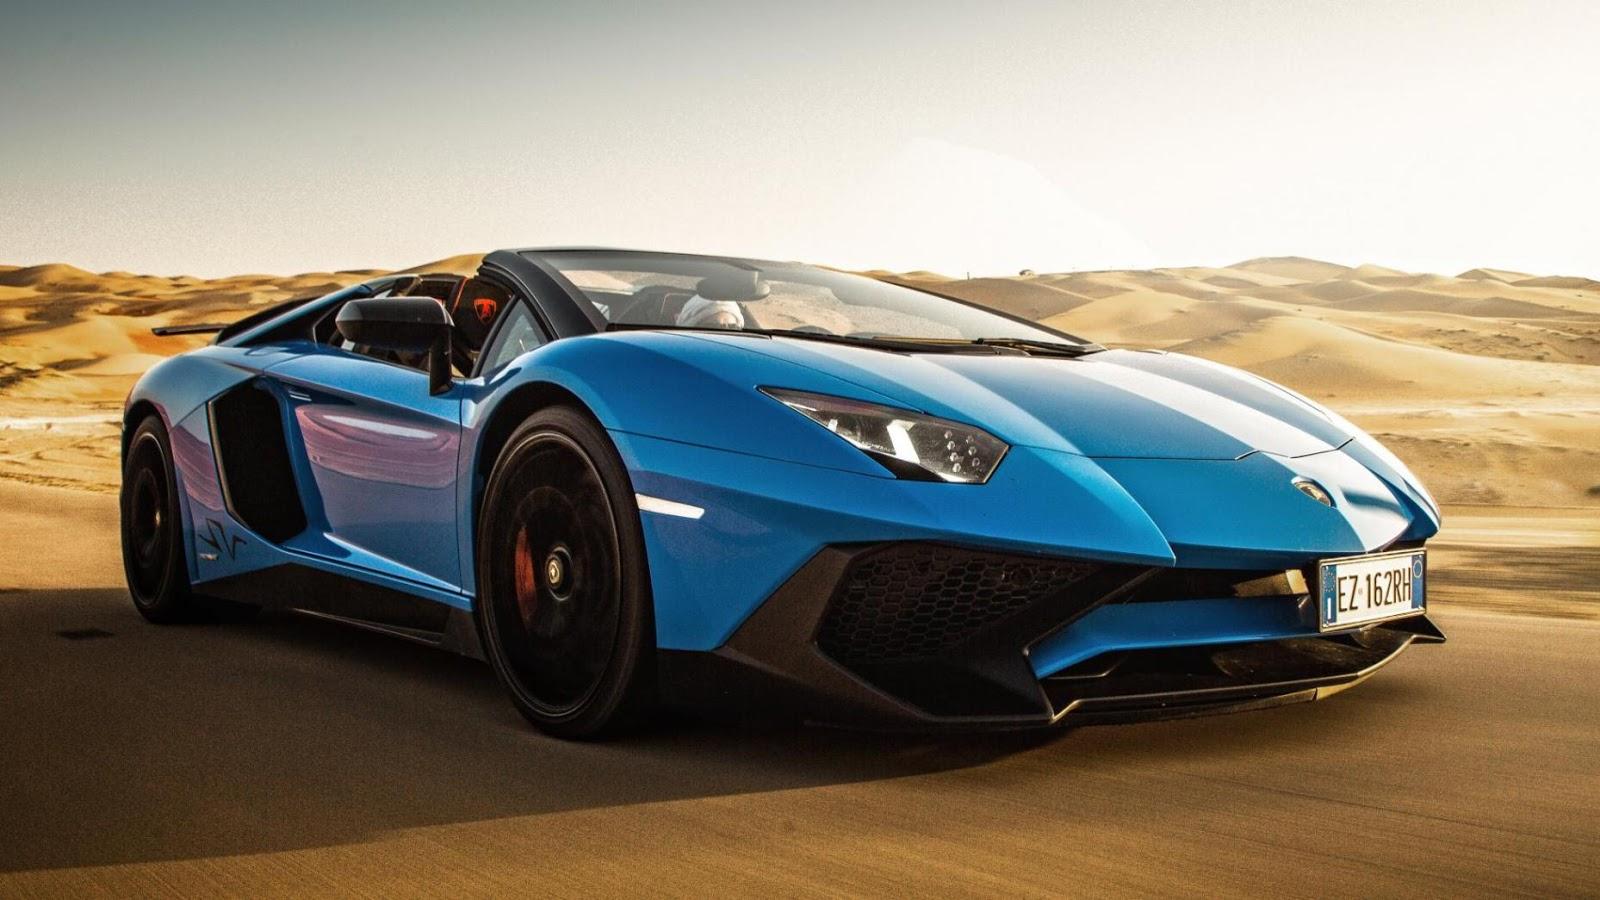 Lamborghini Aventador SV - 2,8 giây